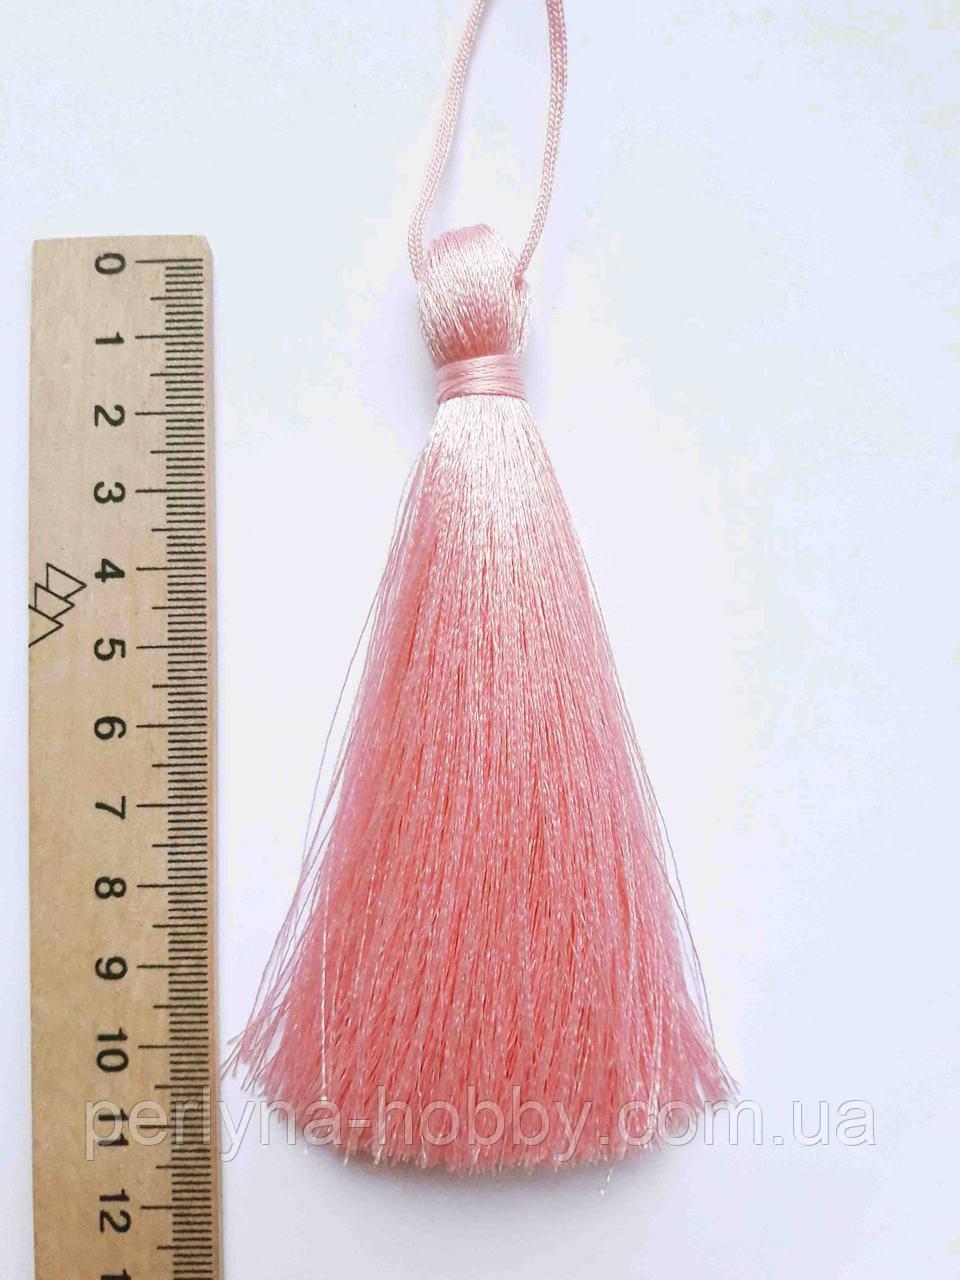 Кисти шелковые декоративные ( 1 шт ) Китиця декоративна велика 10-11 см, рожева, 0184, 1 шт.